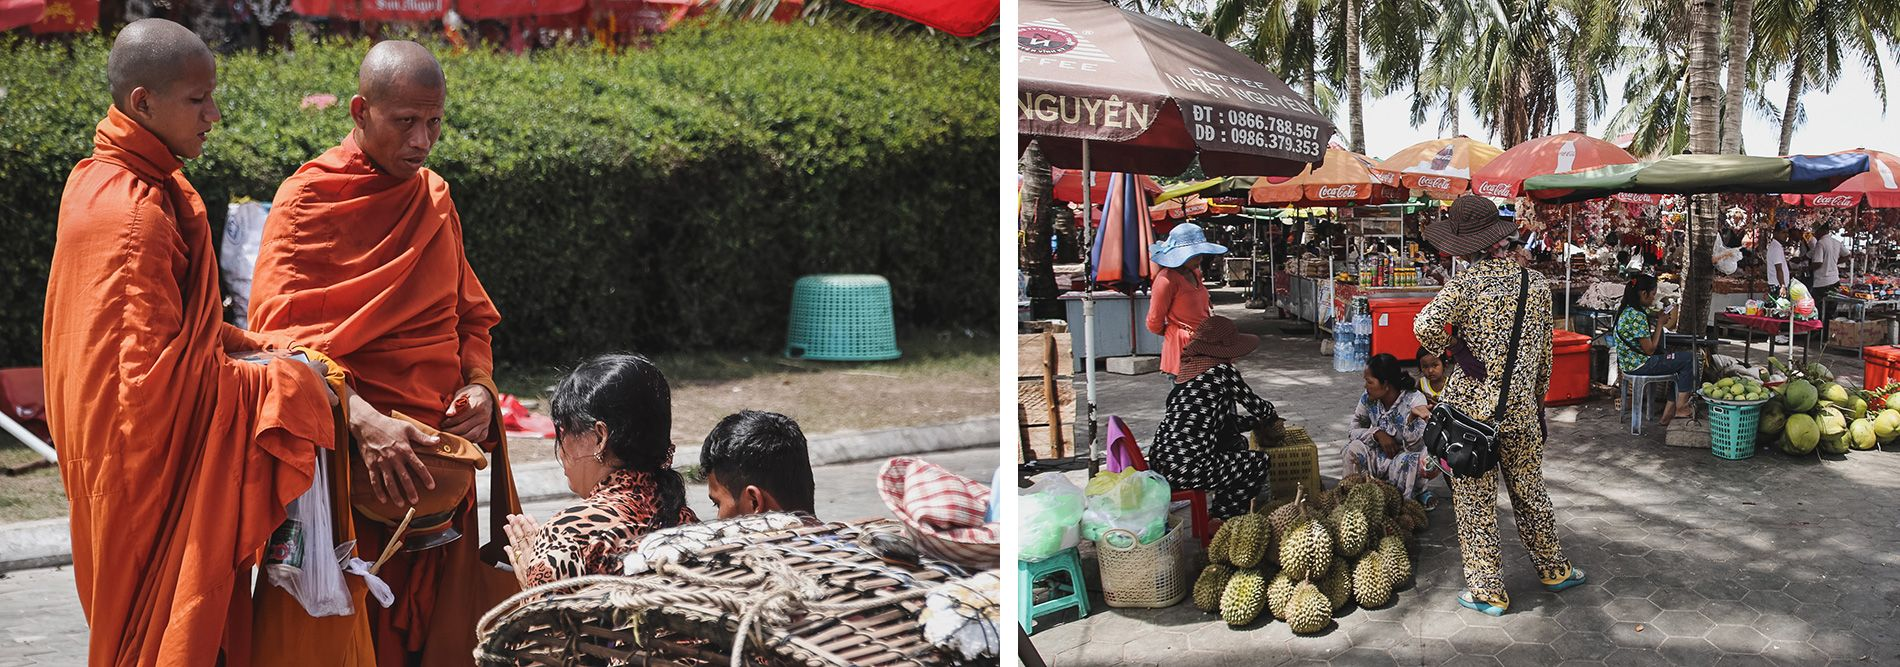 Cambodge | kep | kampot